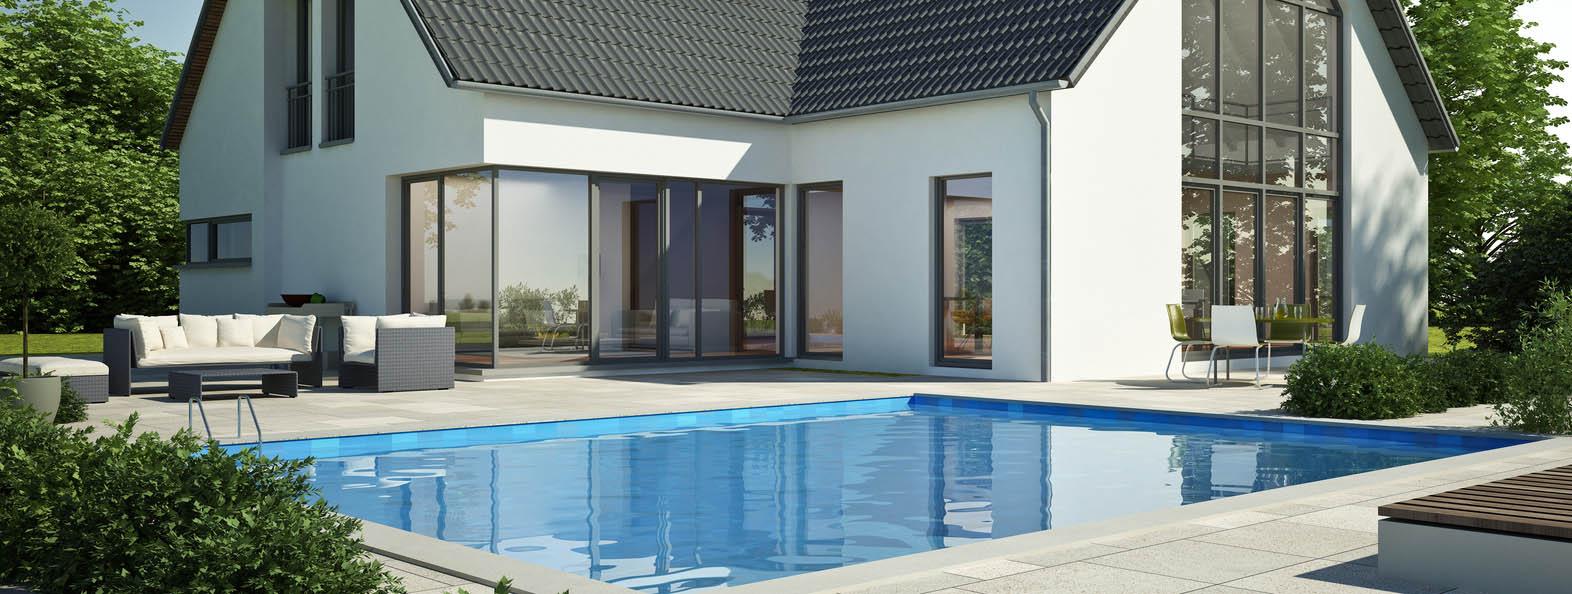 dp immobilien immobilien in k ln bonn verkaufen und vermieten. Black Bedroom Furniture Sets. Home Design Ideas